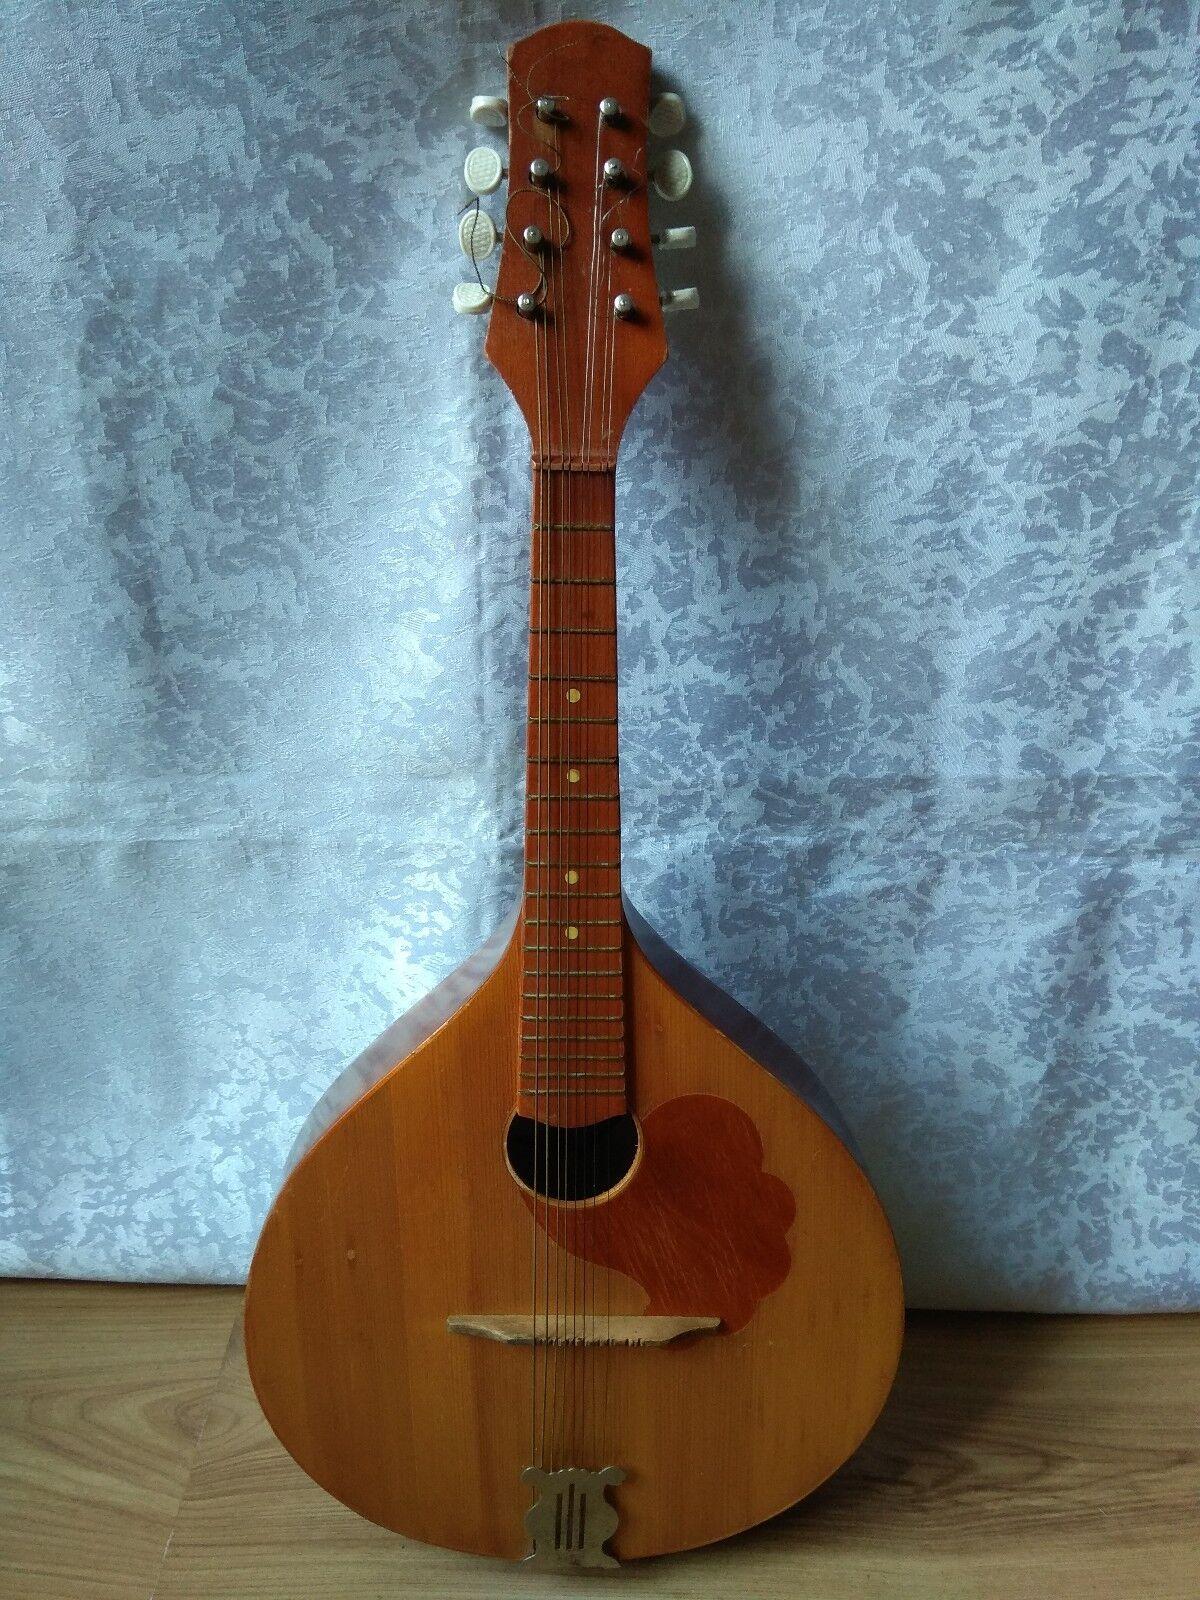 RARE Collectible Musical Instrument USSR Soviet 8 strings Vintage Domra MANDOLIN